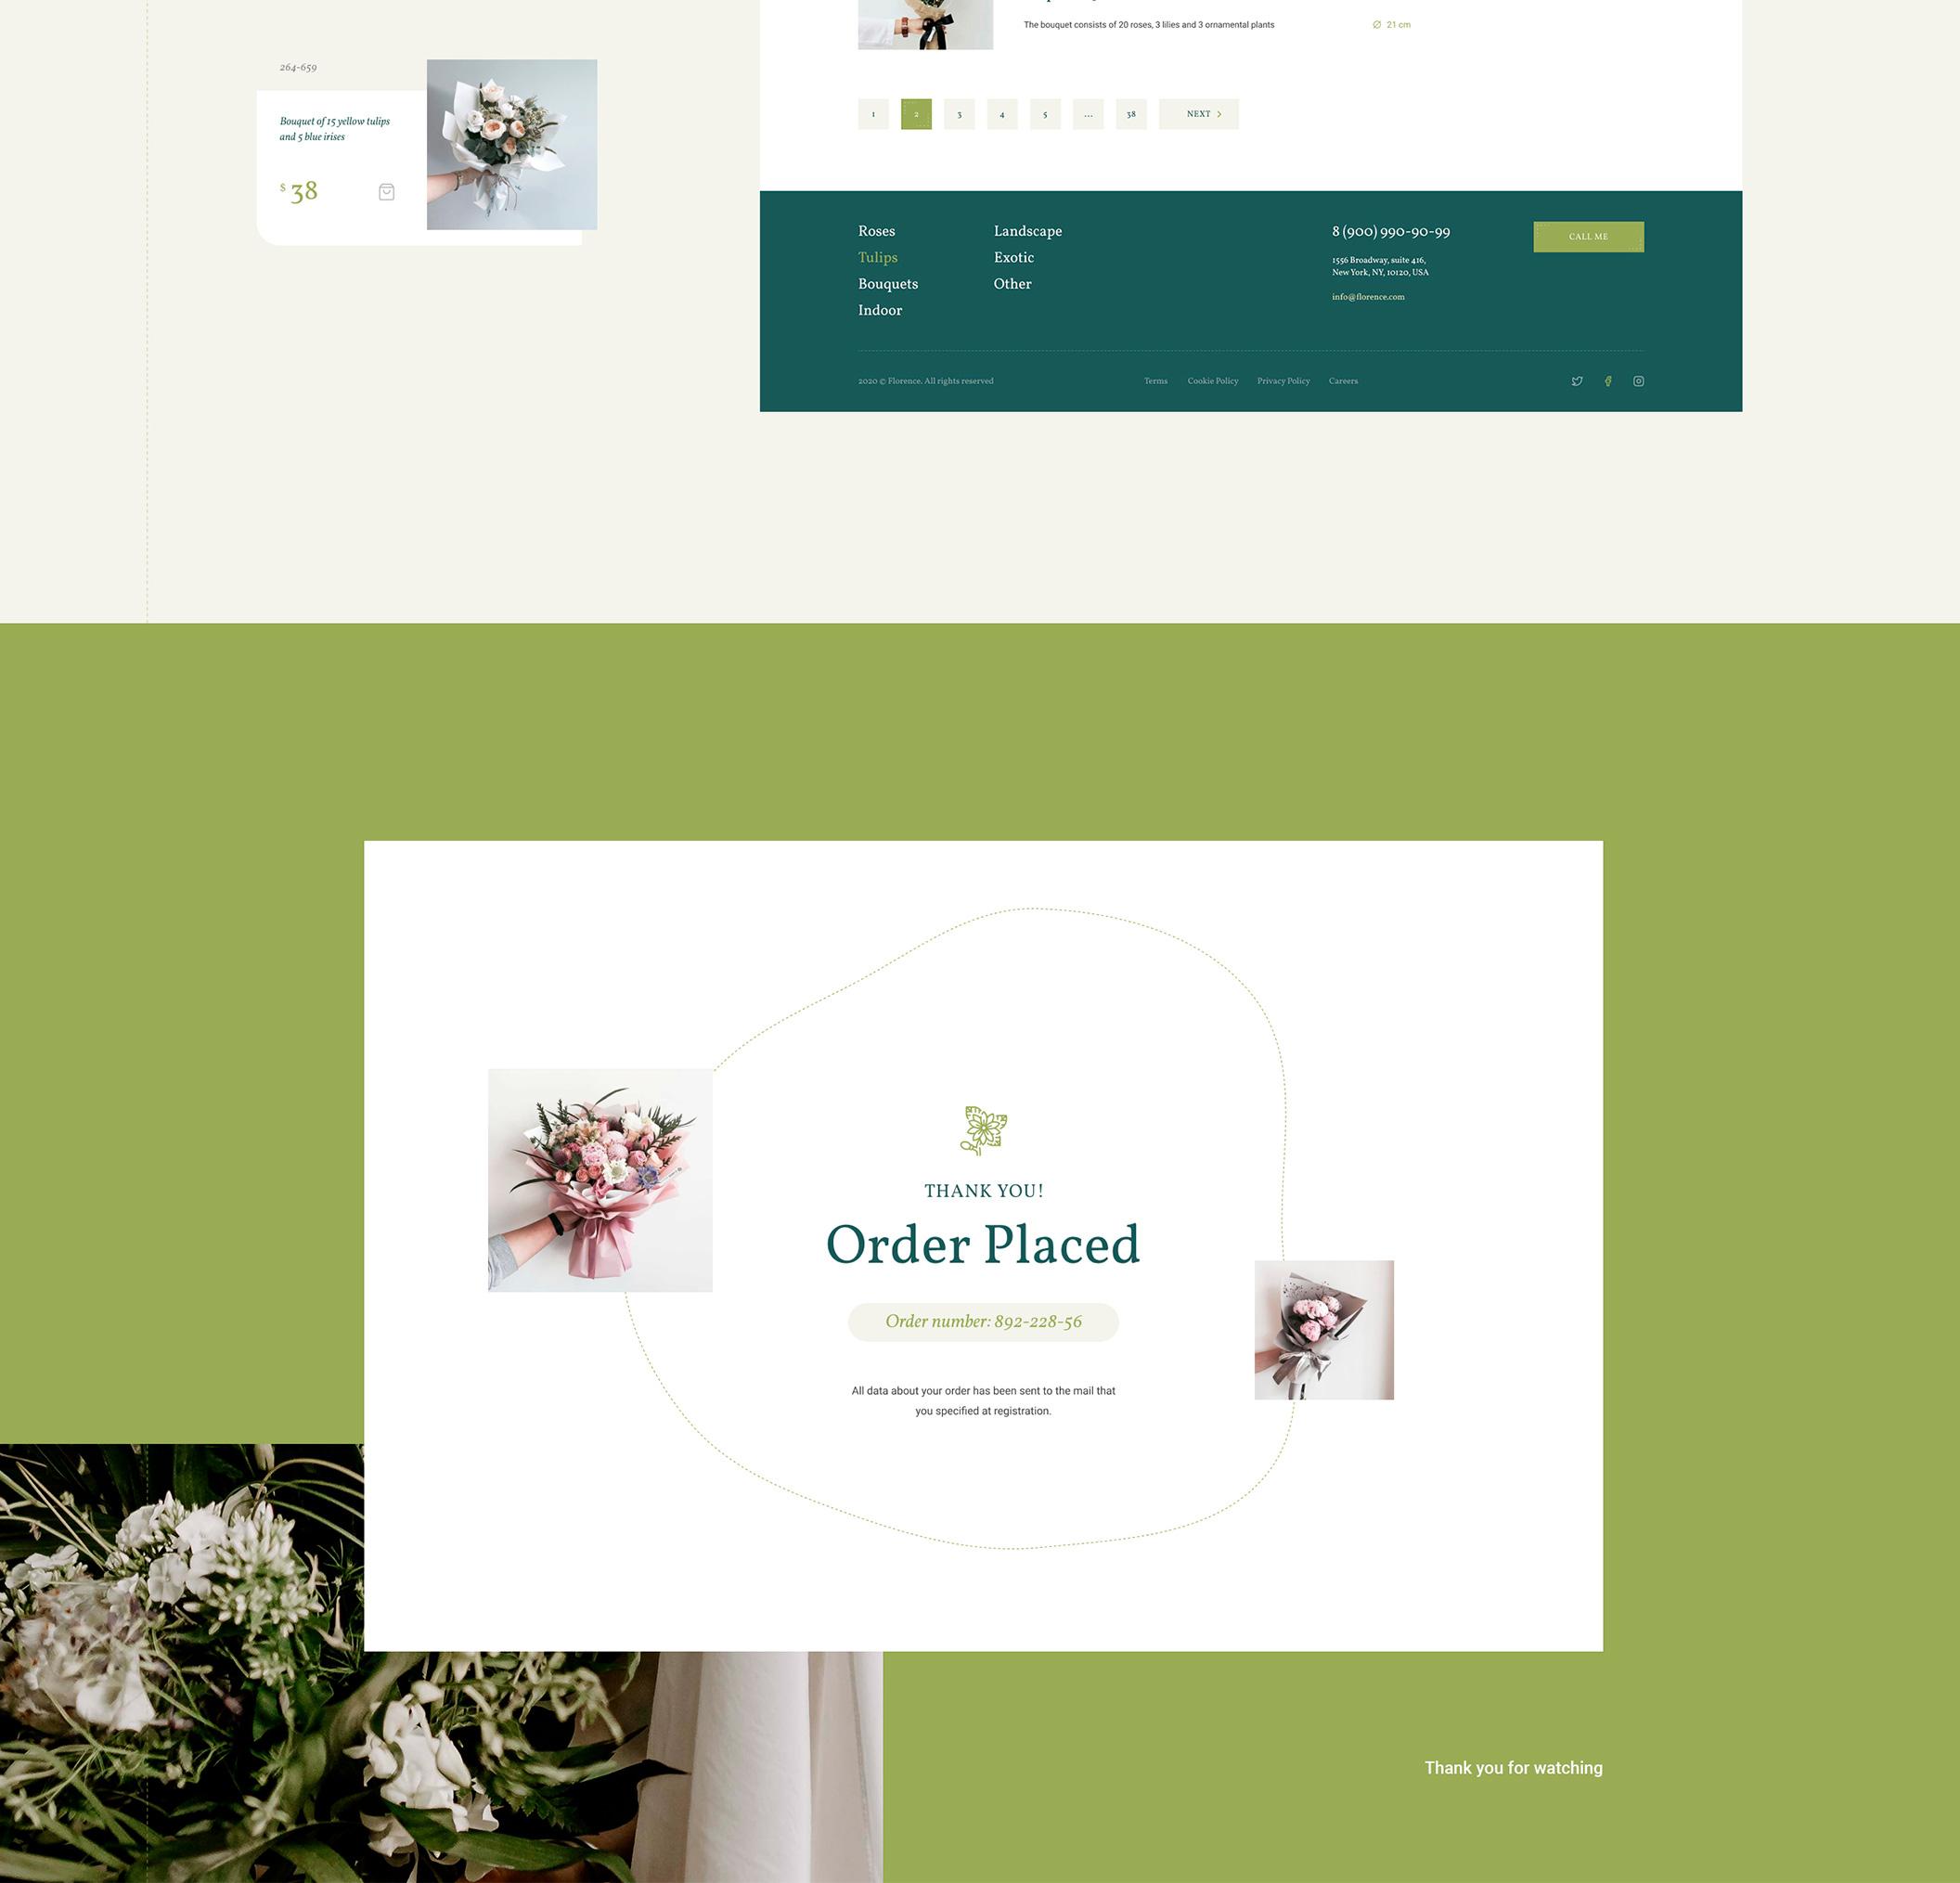 时尚花店电子商城网站WEB设计模板 Florence – eCommerce Web UI Kit插图(5)